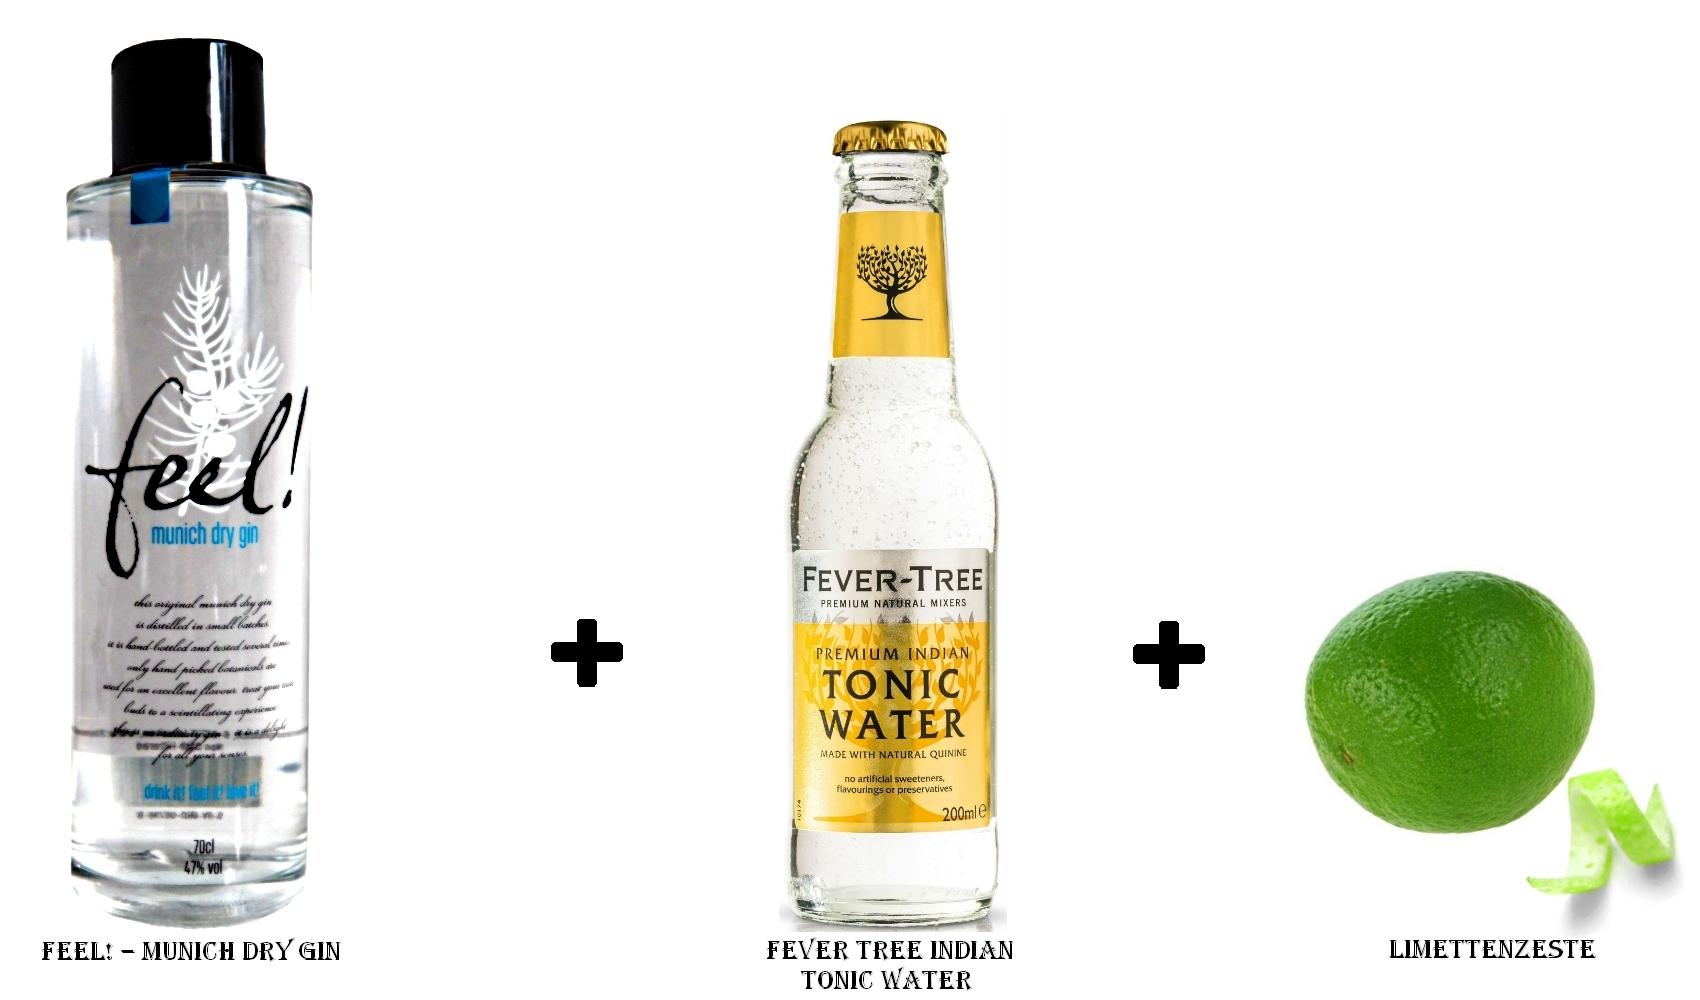 Feel! – Munich Dry Gin + Fever Tree Indian Tonic Water + Limettenzeste